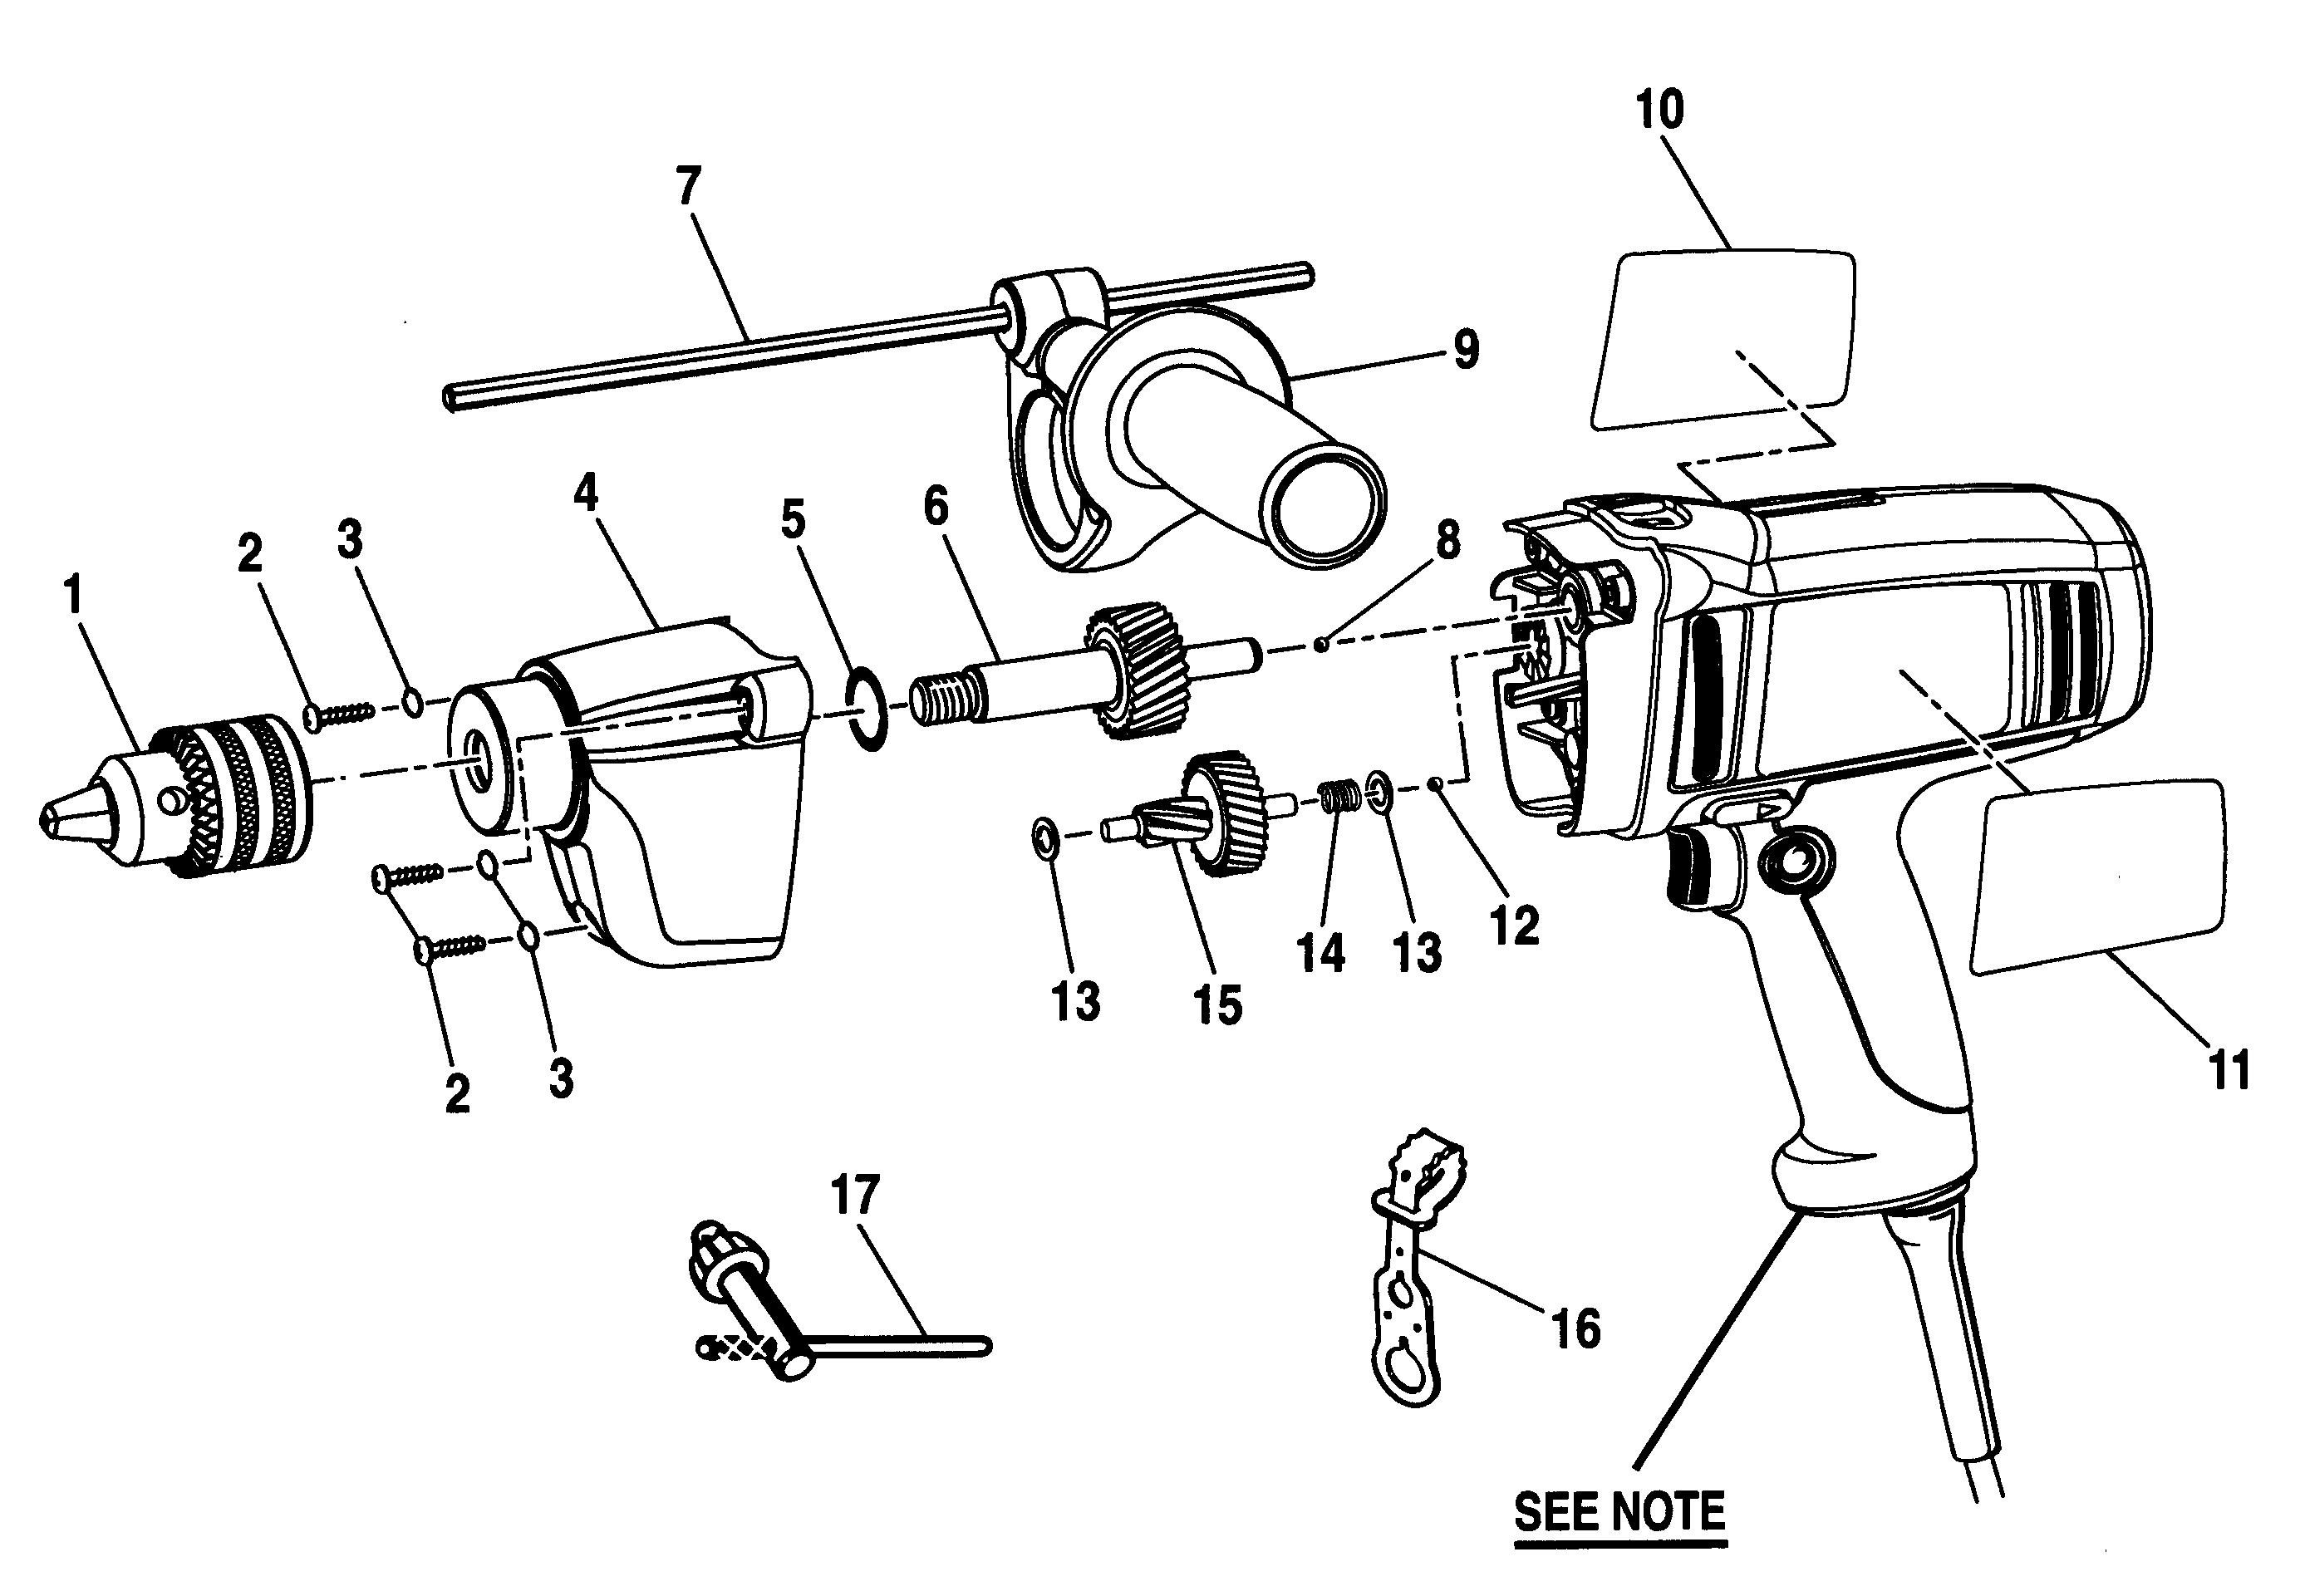 DRILL Diagram & Parts List for Model 315101360 Craftsman